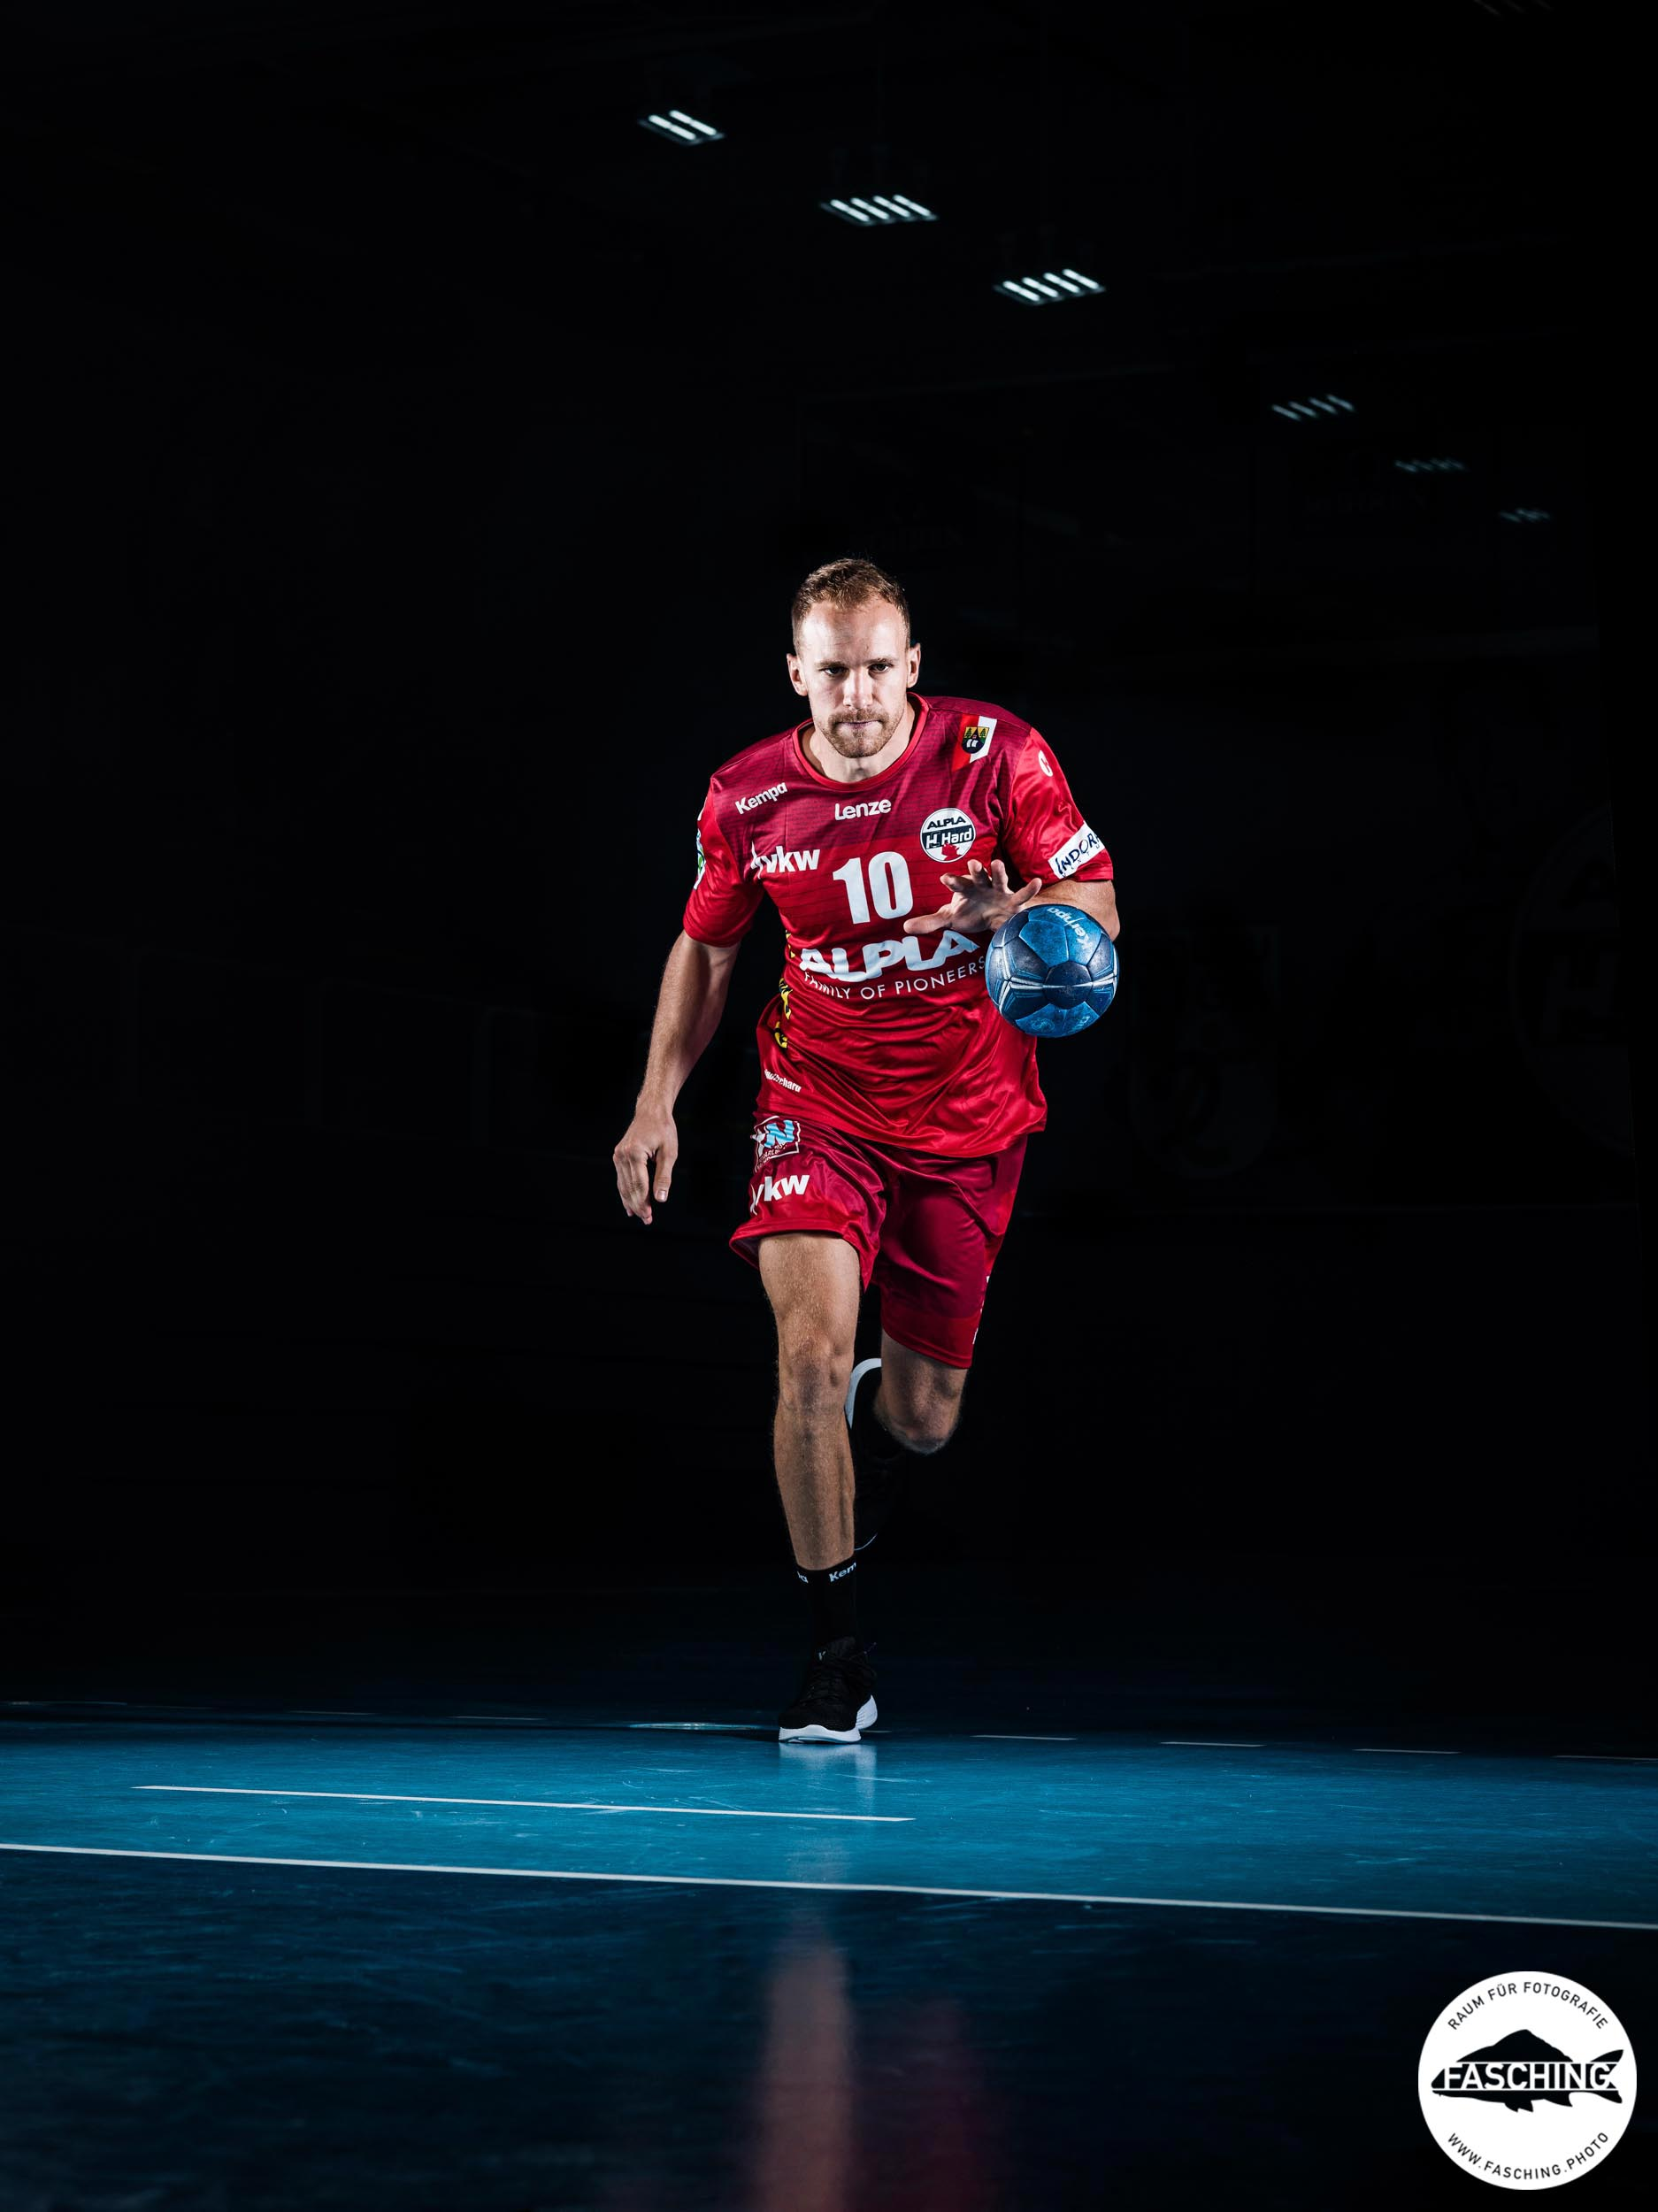 Sport Fotograf Luca Fasching fotografiert für Alpla Hard